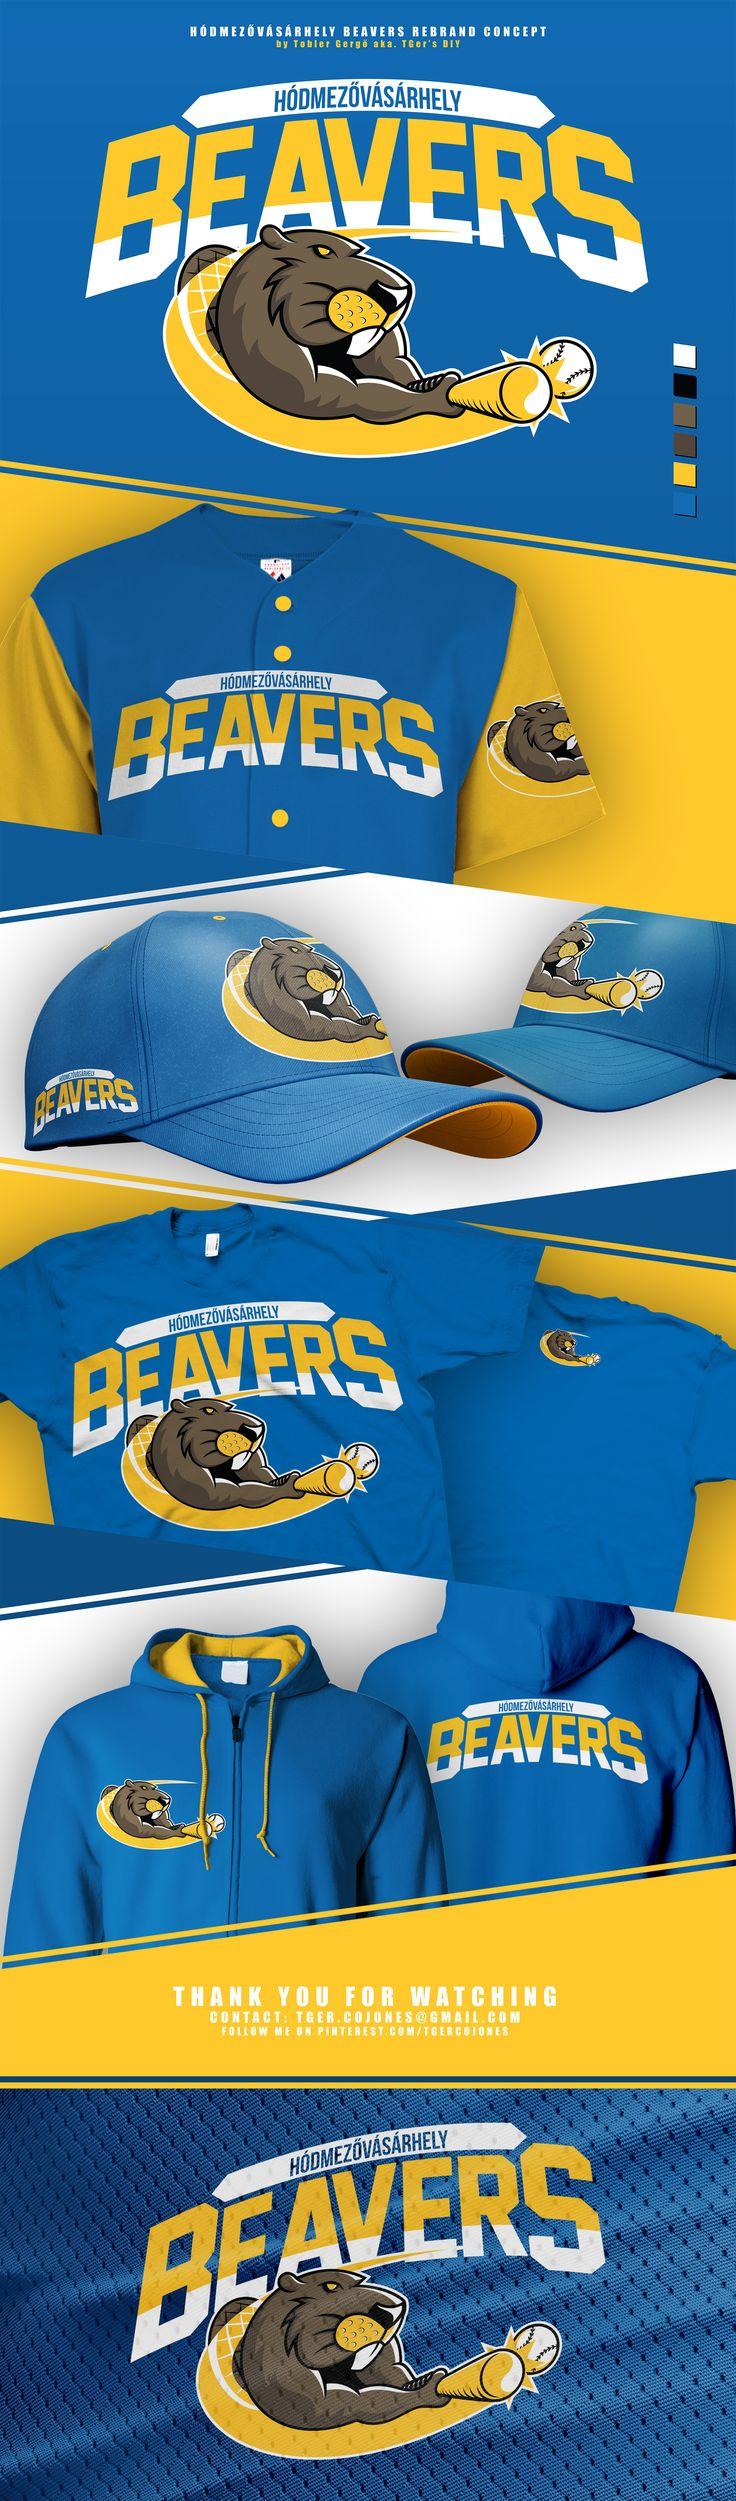 Mascot logo and rebrand concept for the Hódmezővásárhely Beavers baseball team from Hungary.  Made by Tobler Gergő aka TGer's DIY  Follow me at Pinterest.com/tgercojones  Learn more: https://www.facebook.com/hodokbaseball/  #tgersdiy